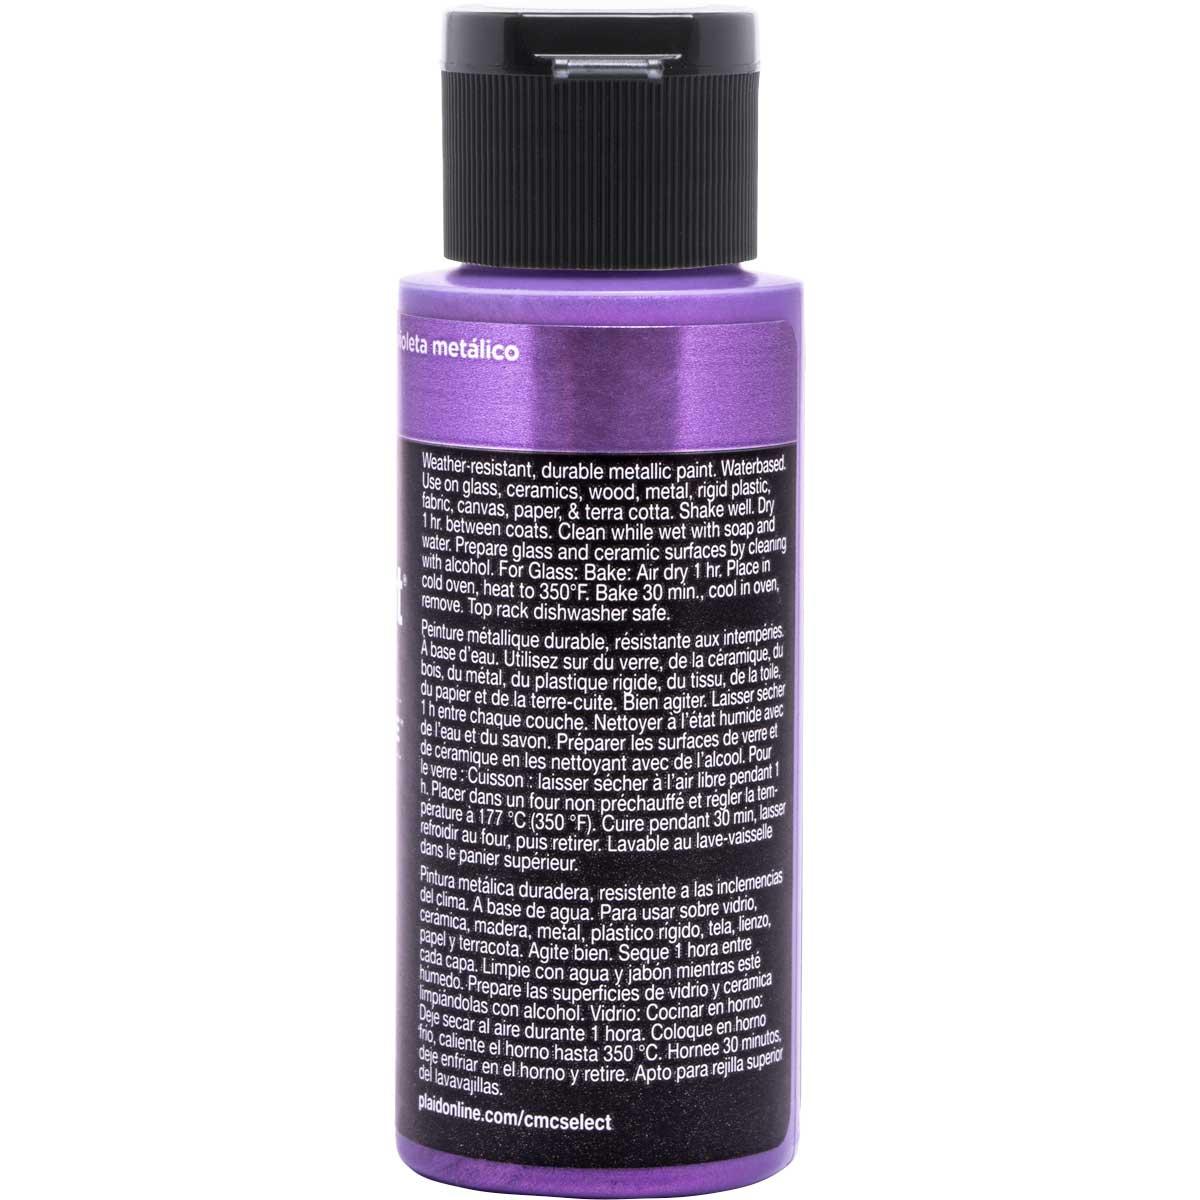 Delta Ceramcoat ® Select Multi-Surface Acrylic Paint - Metallic - Purple, 2 oz. - 04106